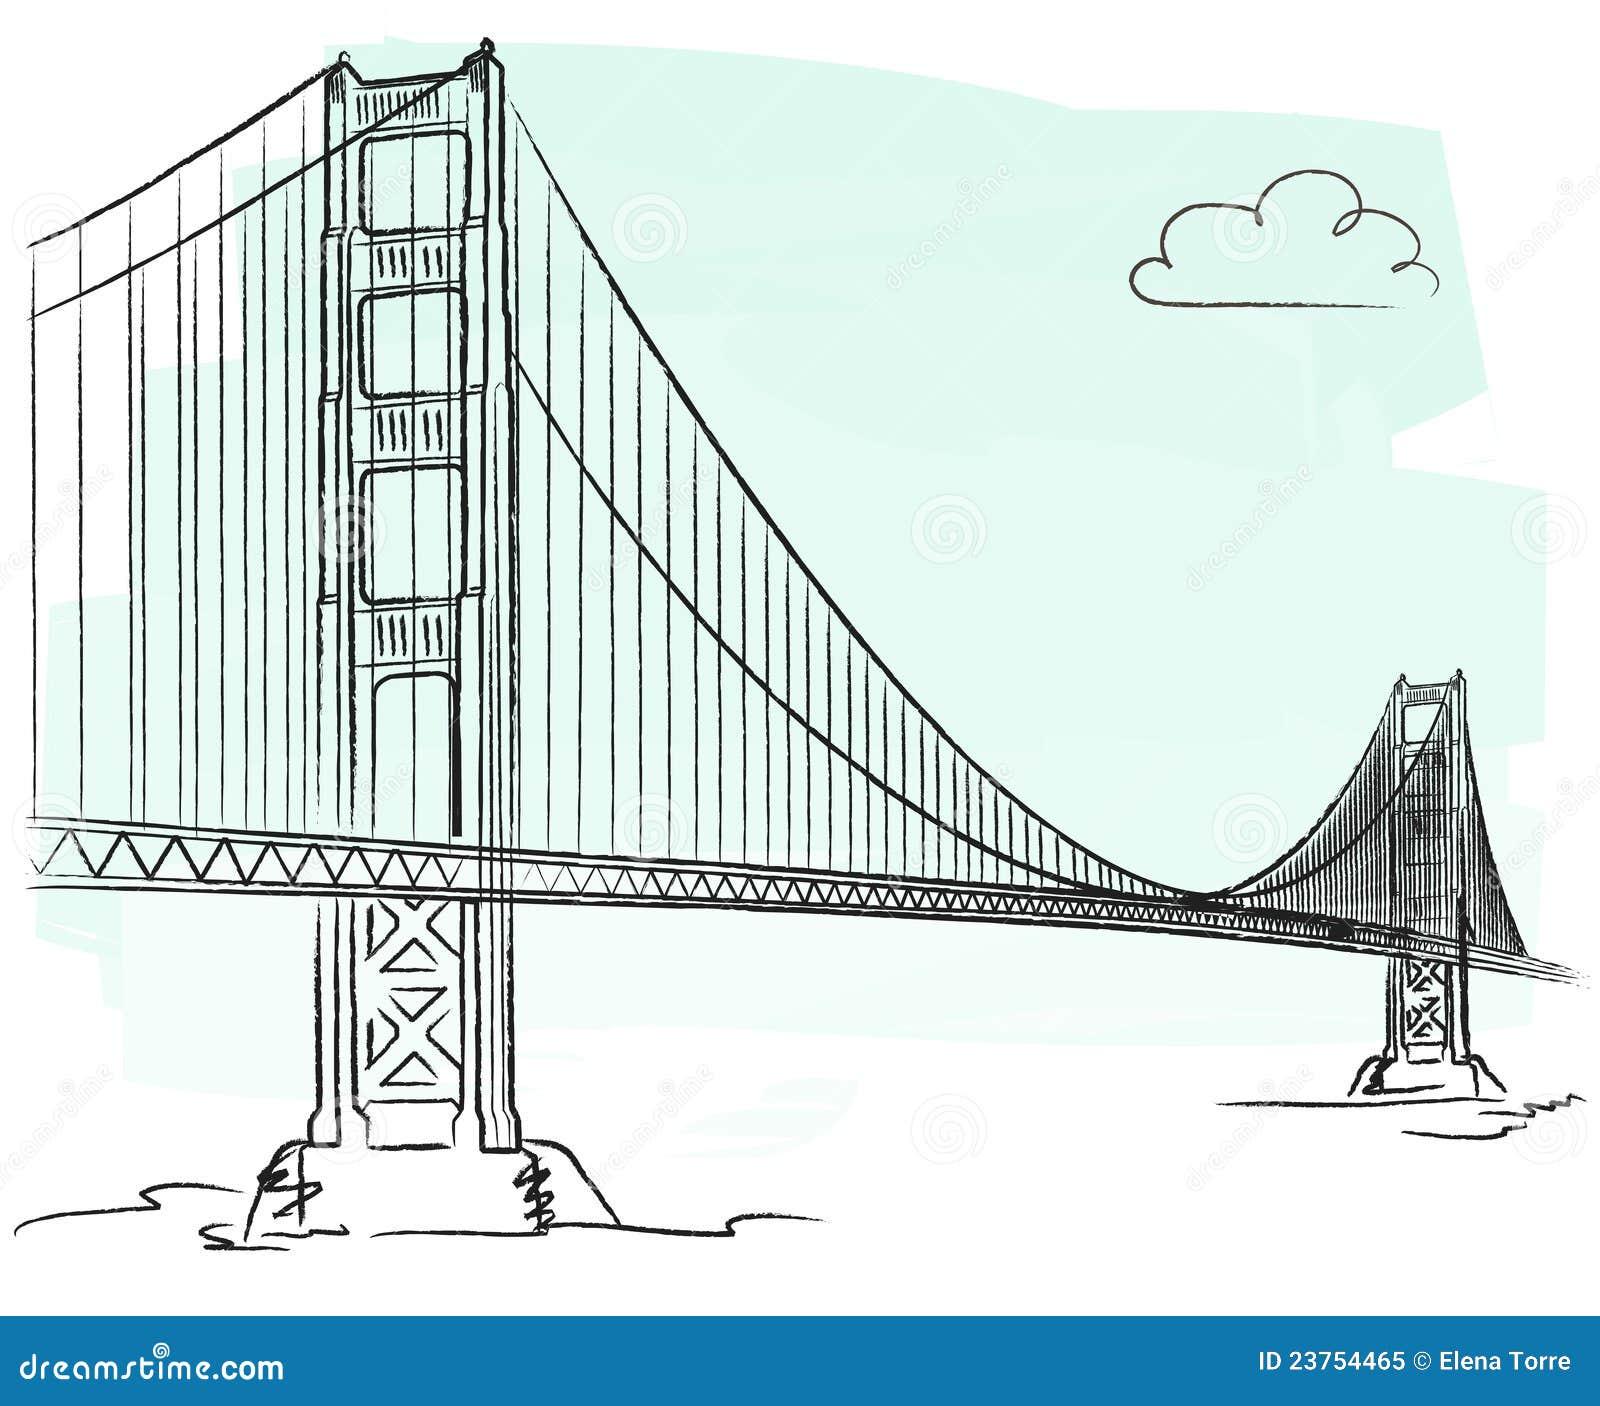 Golden Gate Bridge Vector Illustrator File Golden gate vector